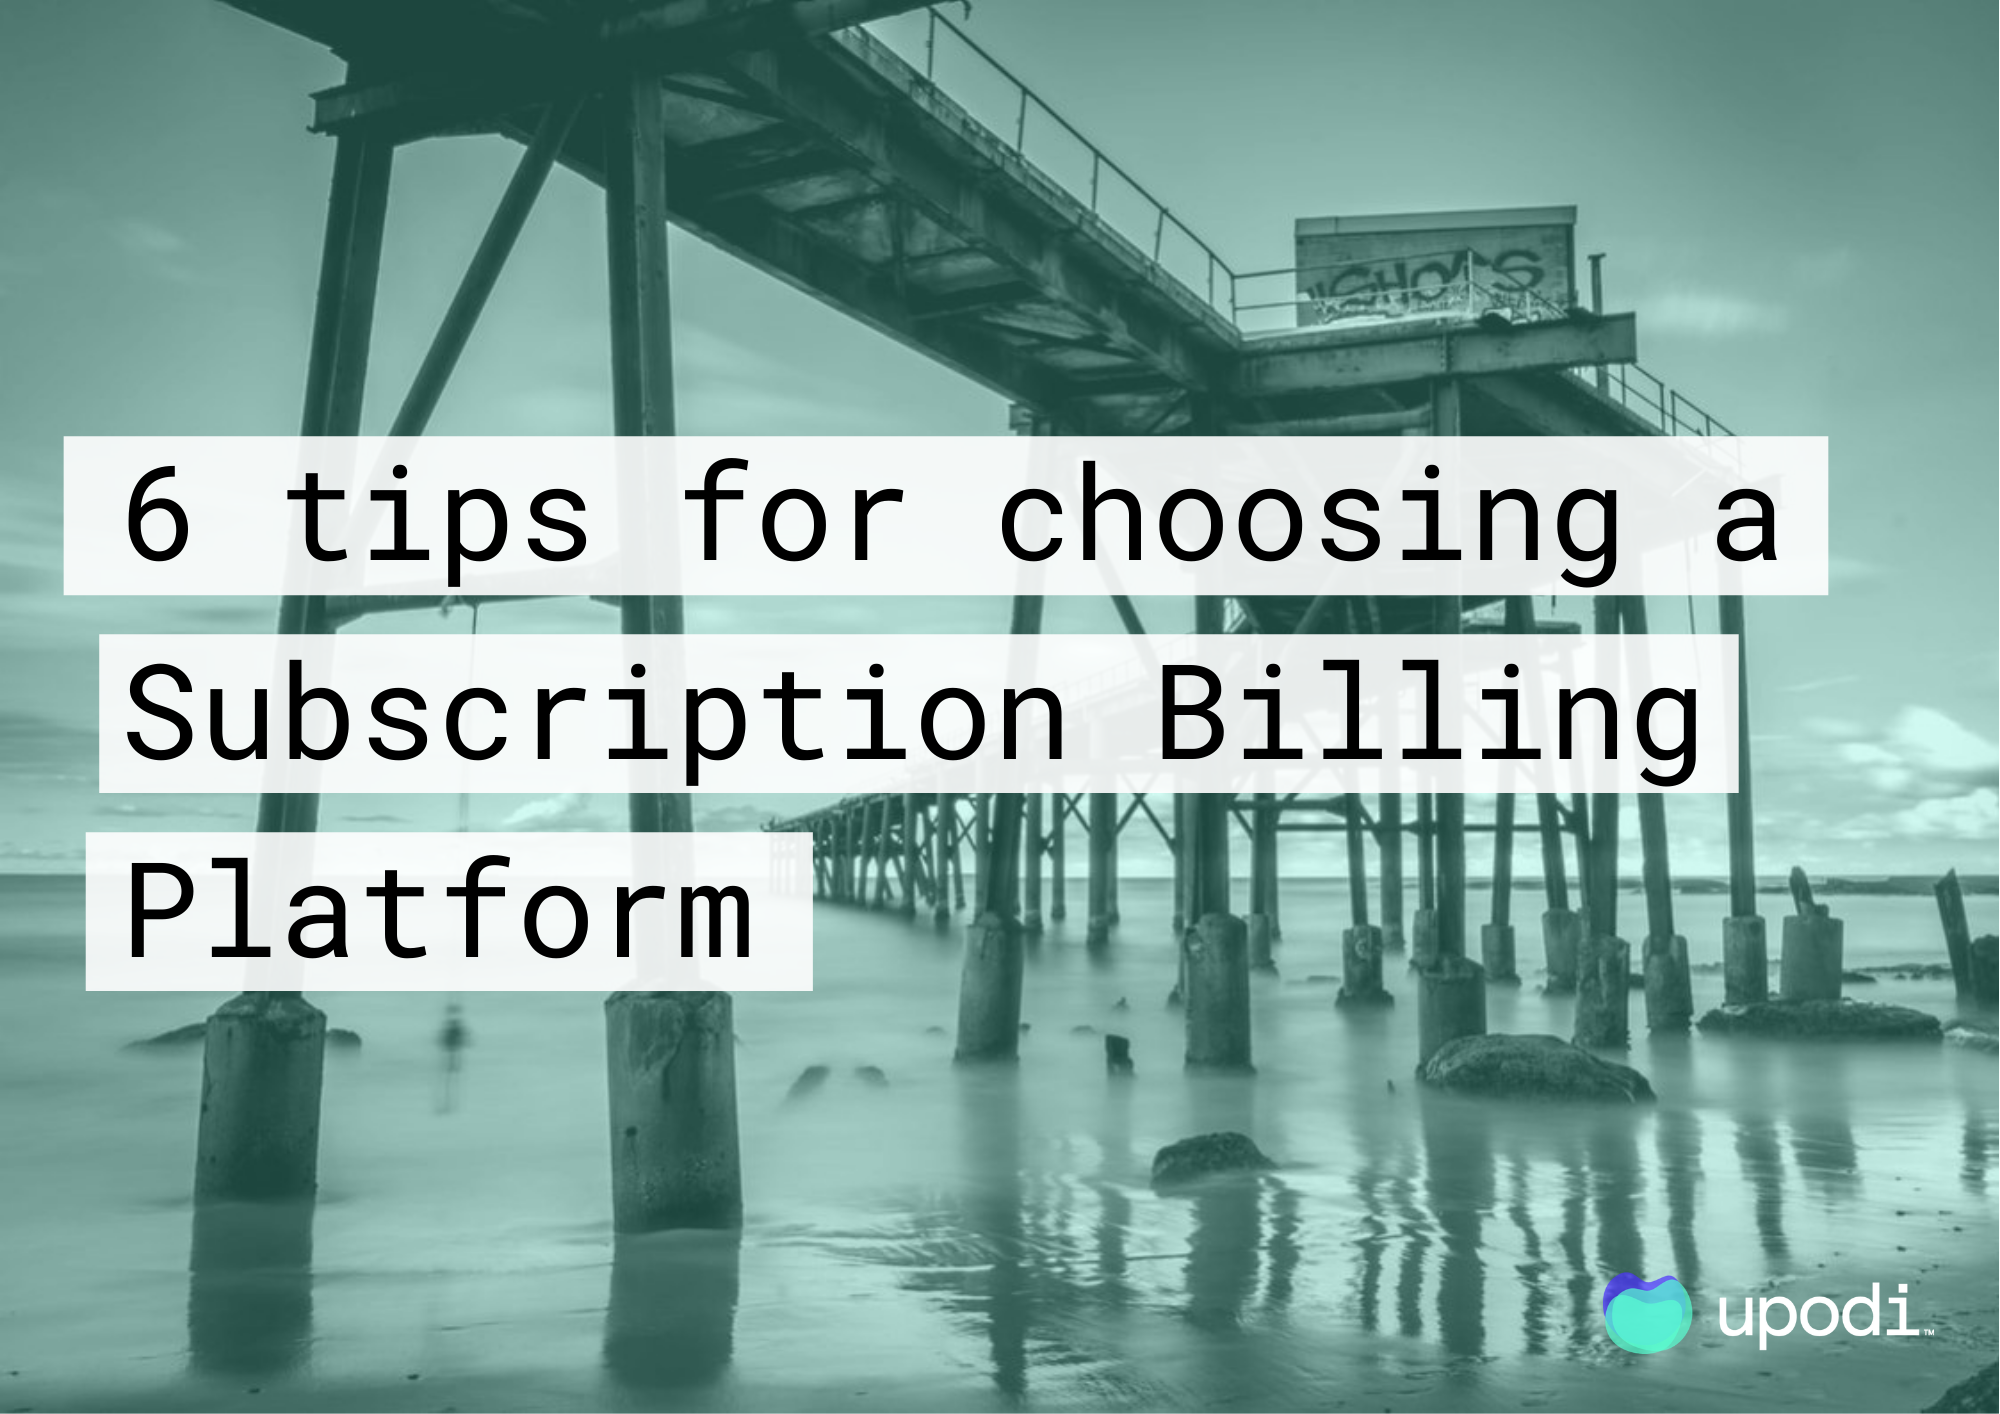 6 Tips for Choosing a Subscription Billing Platform (1)